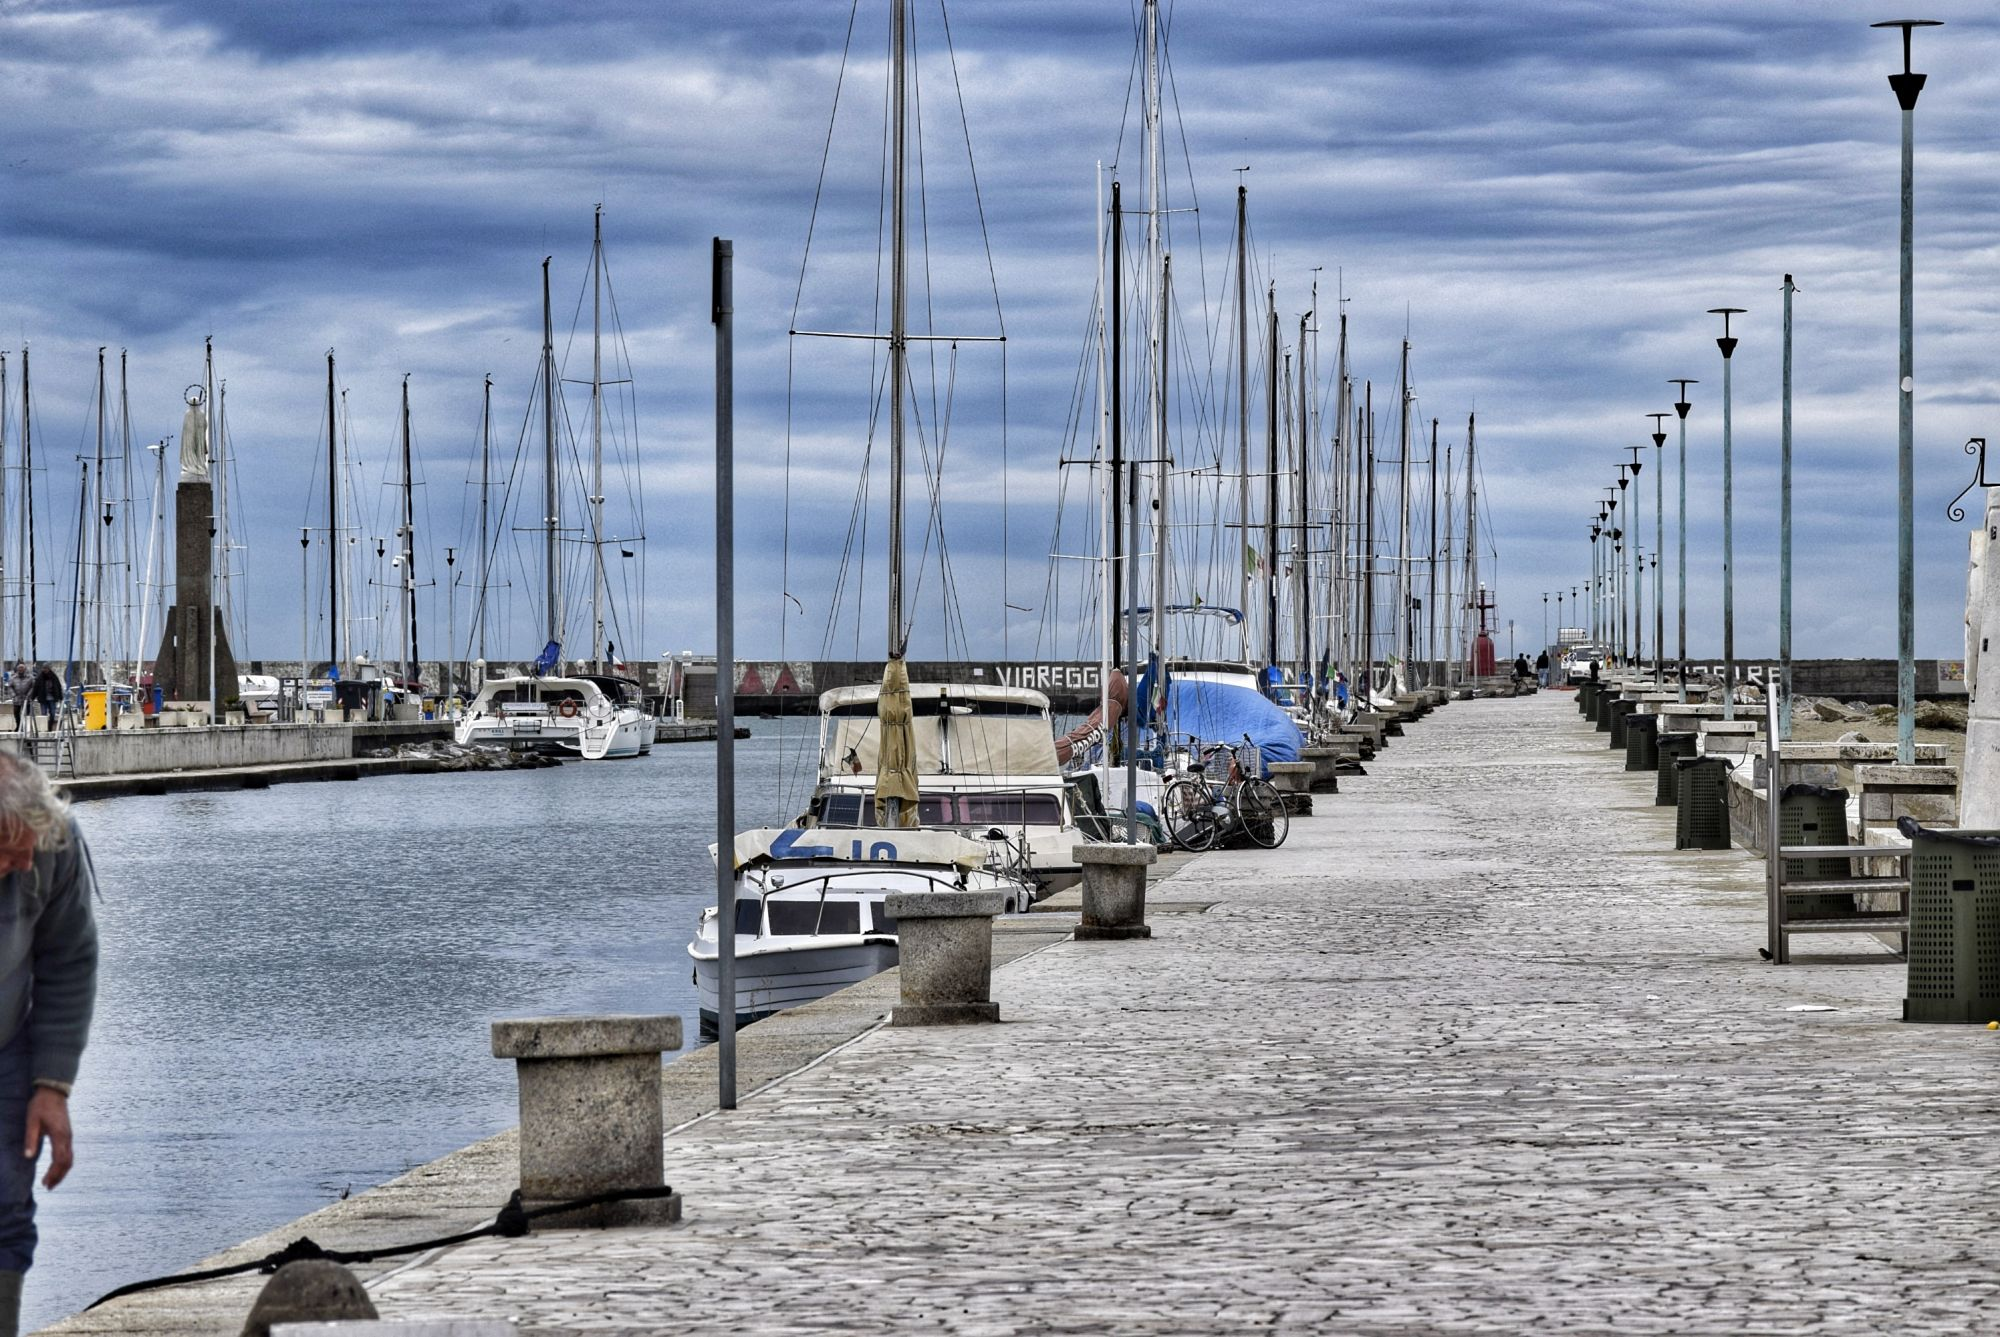 Pescano novellame protetto, ammende per 24 mila euro